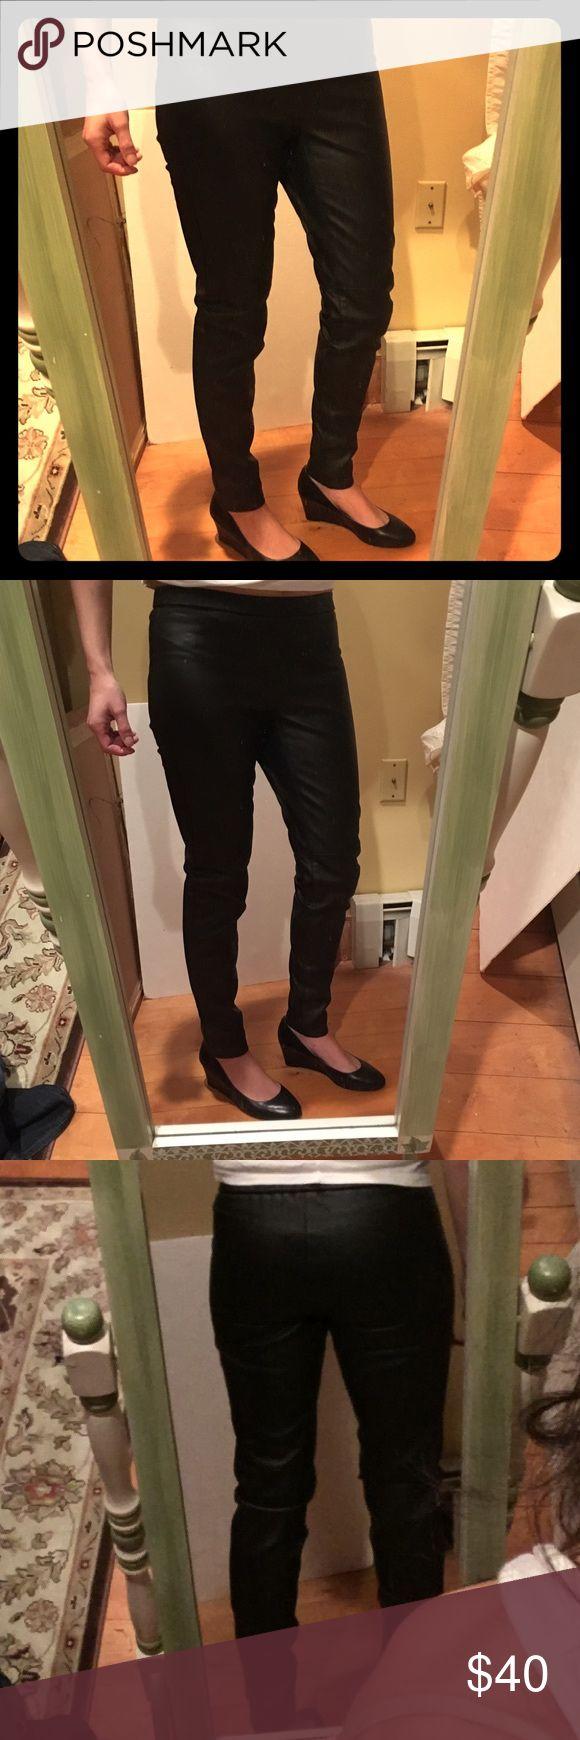 ⭐NEW Michael Kors Pants New Black pleather pants. Skinny style with elastic waist.  Size 4 Petite Michael Kors Pants Skinny